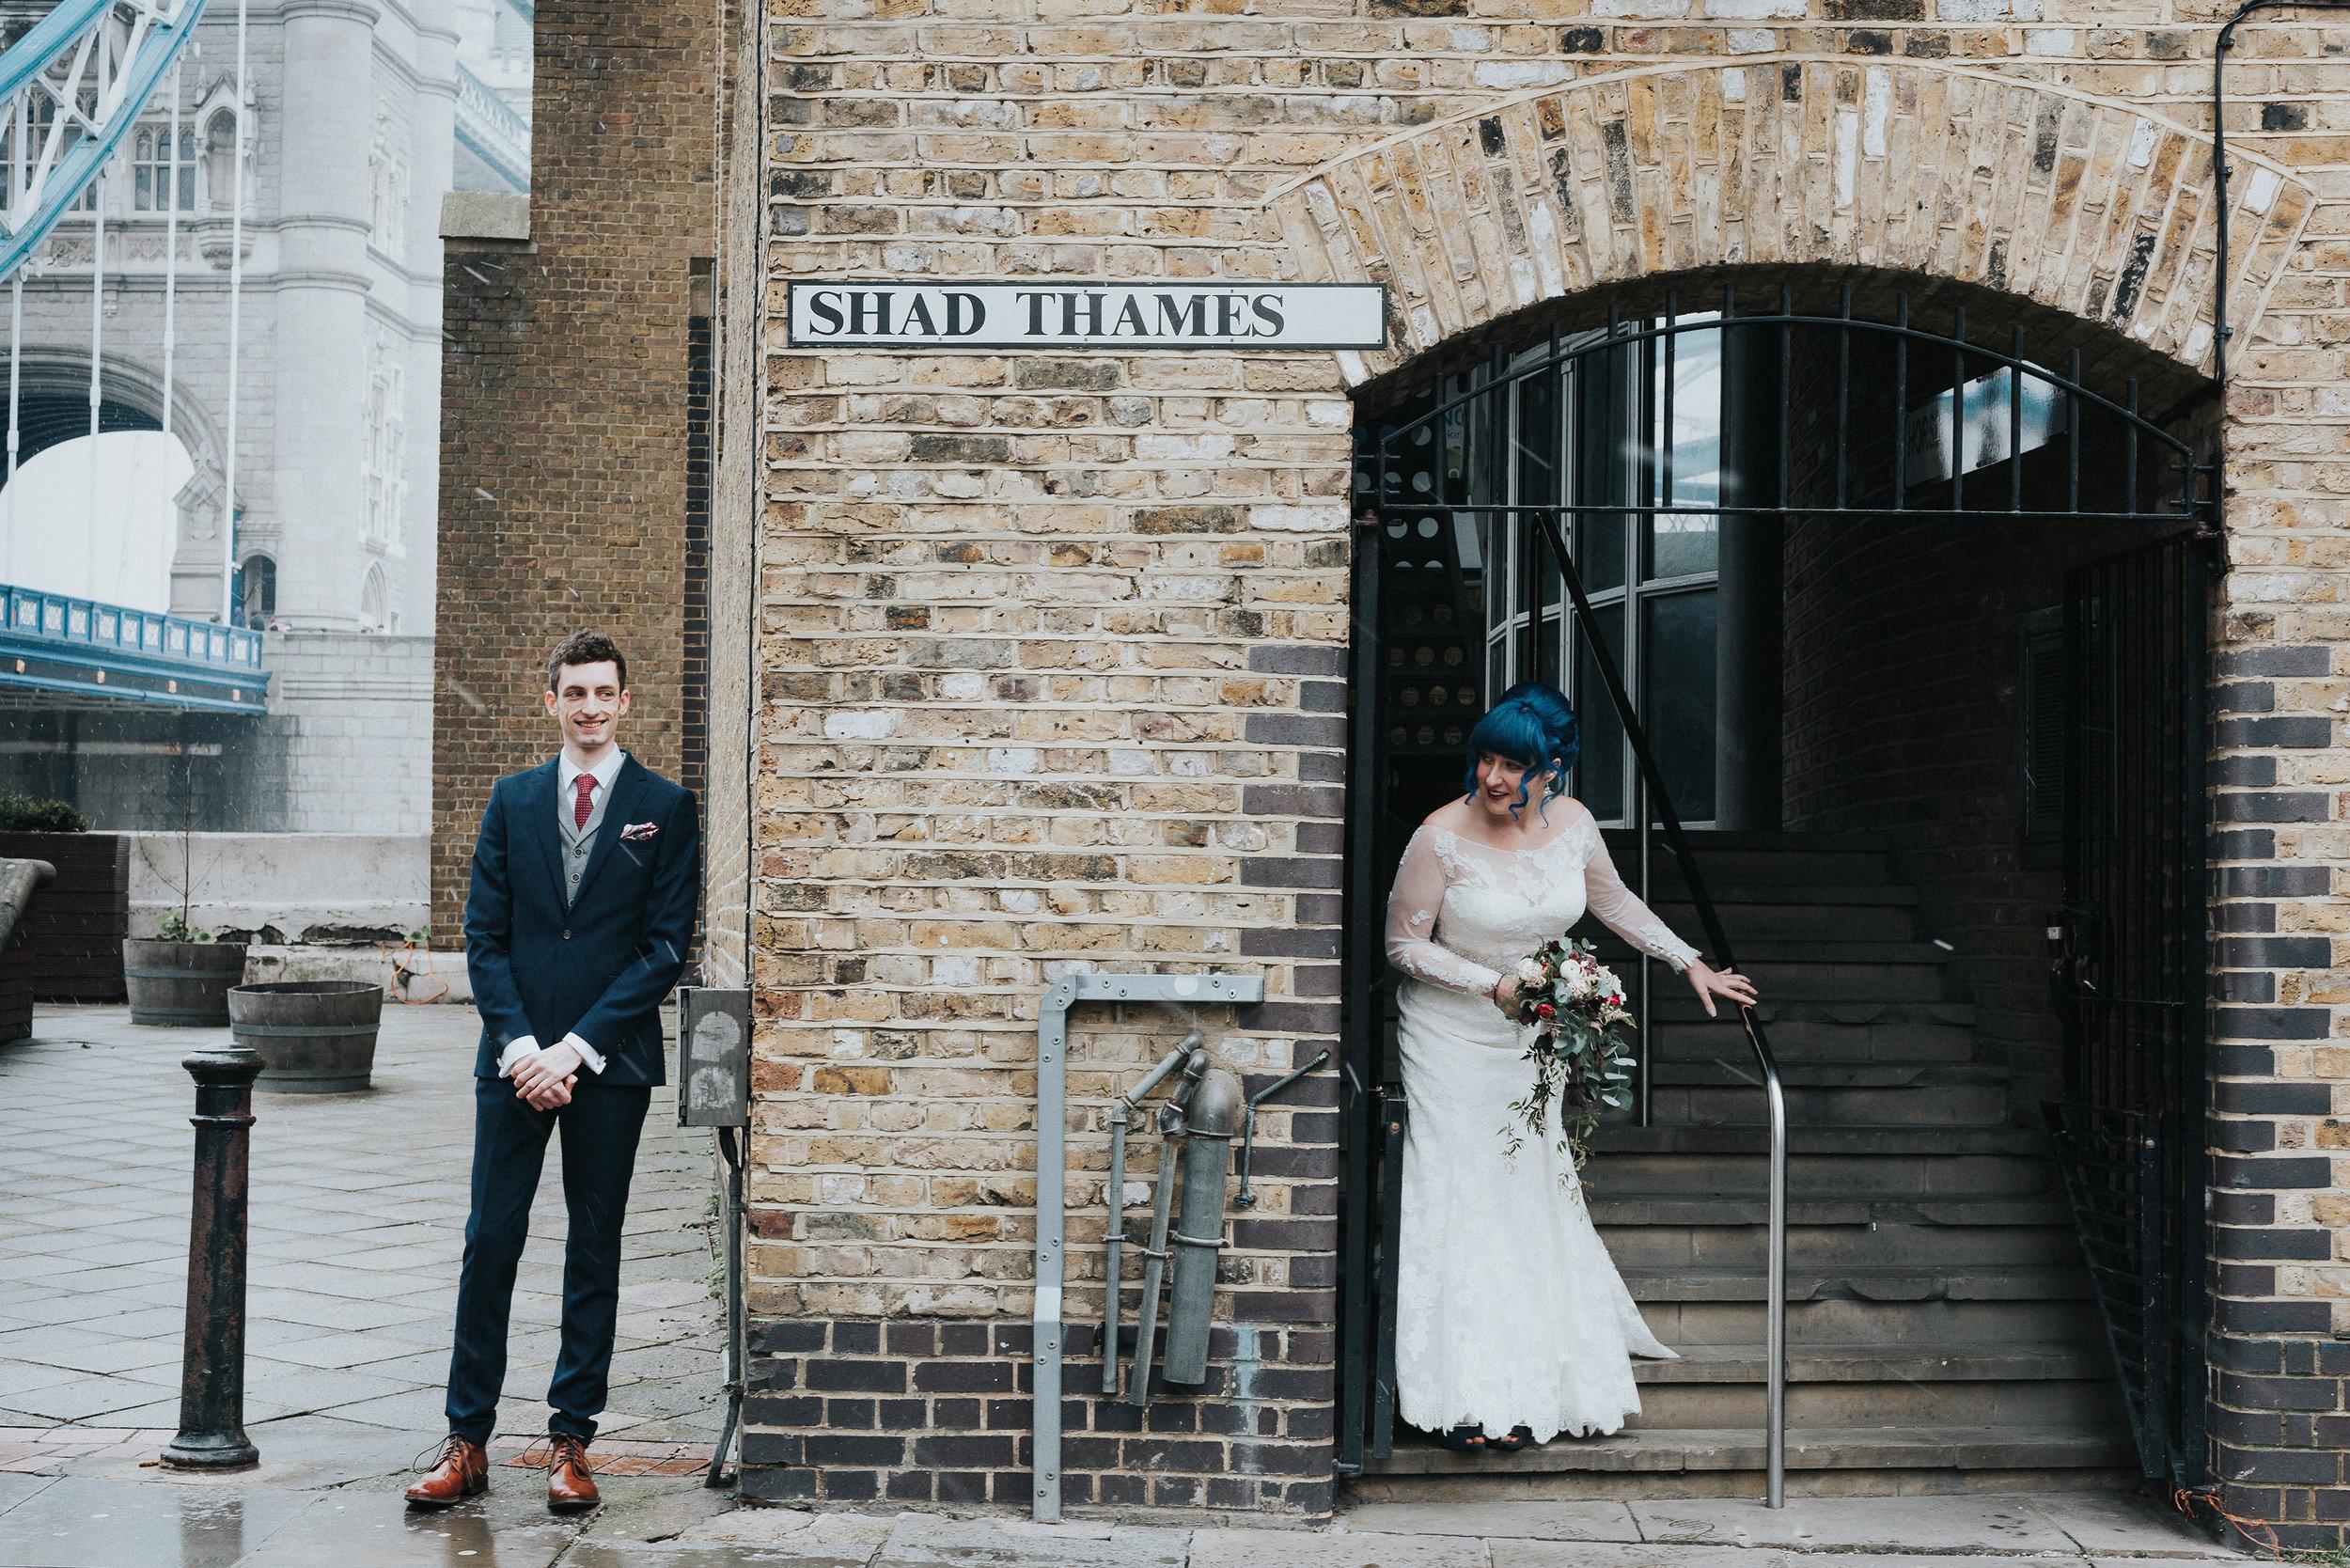 London-Chic-Alternative-Wedding-Jay-Tunbridge-Photographic-Co-3.jpg